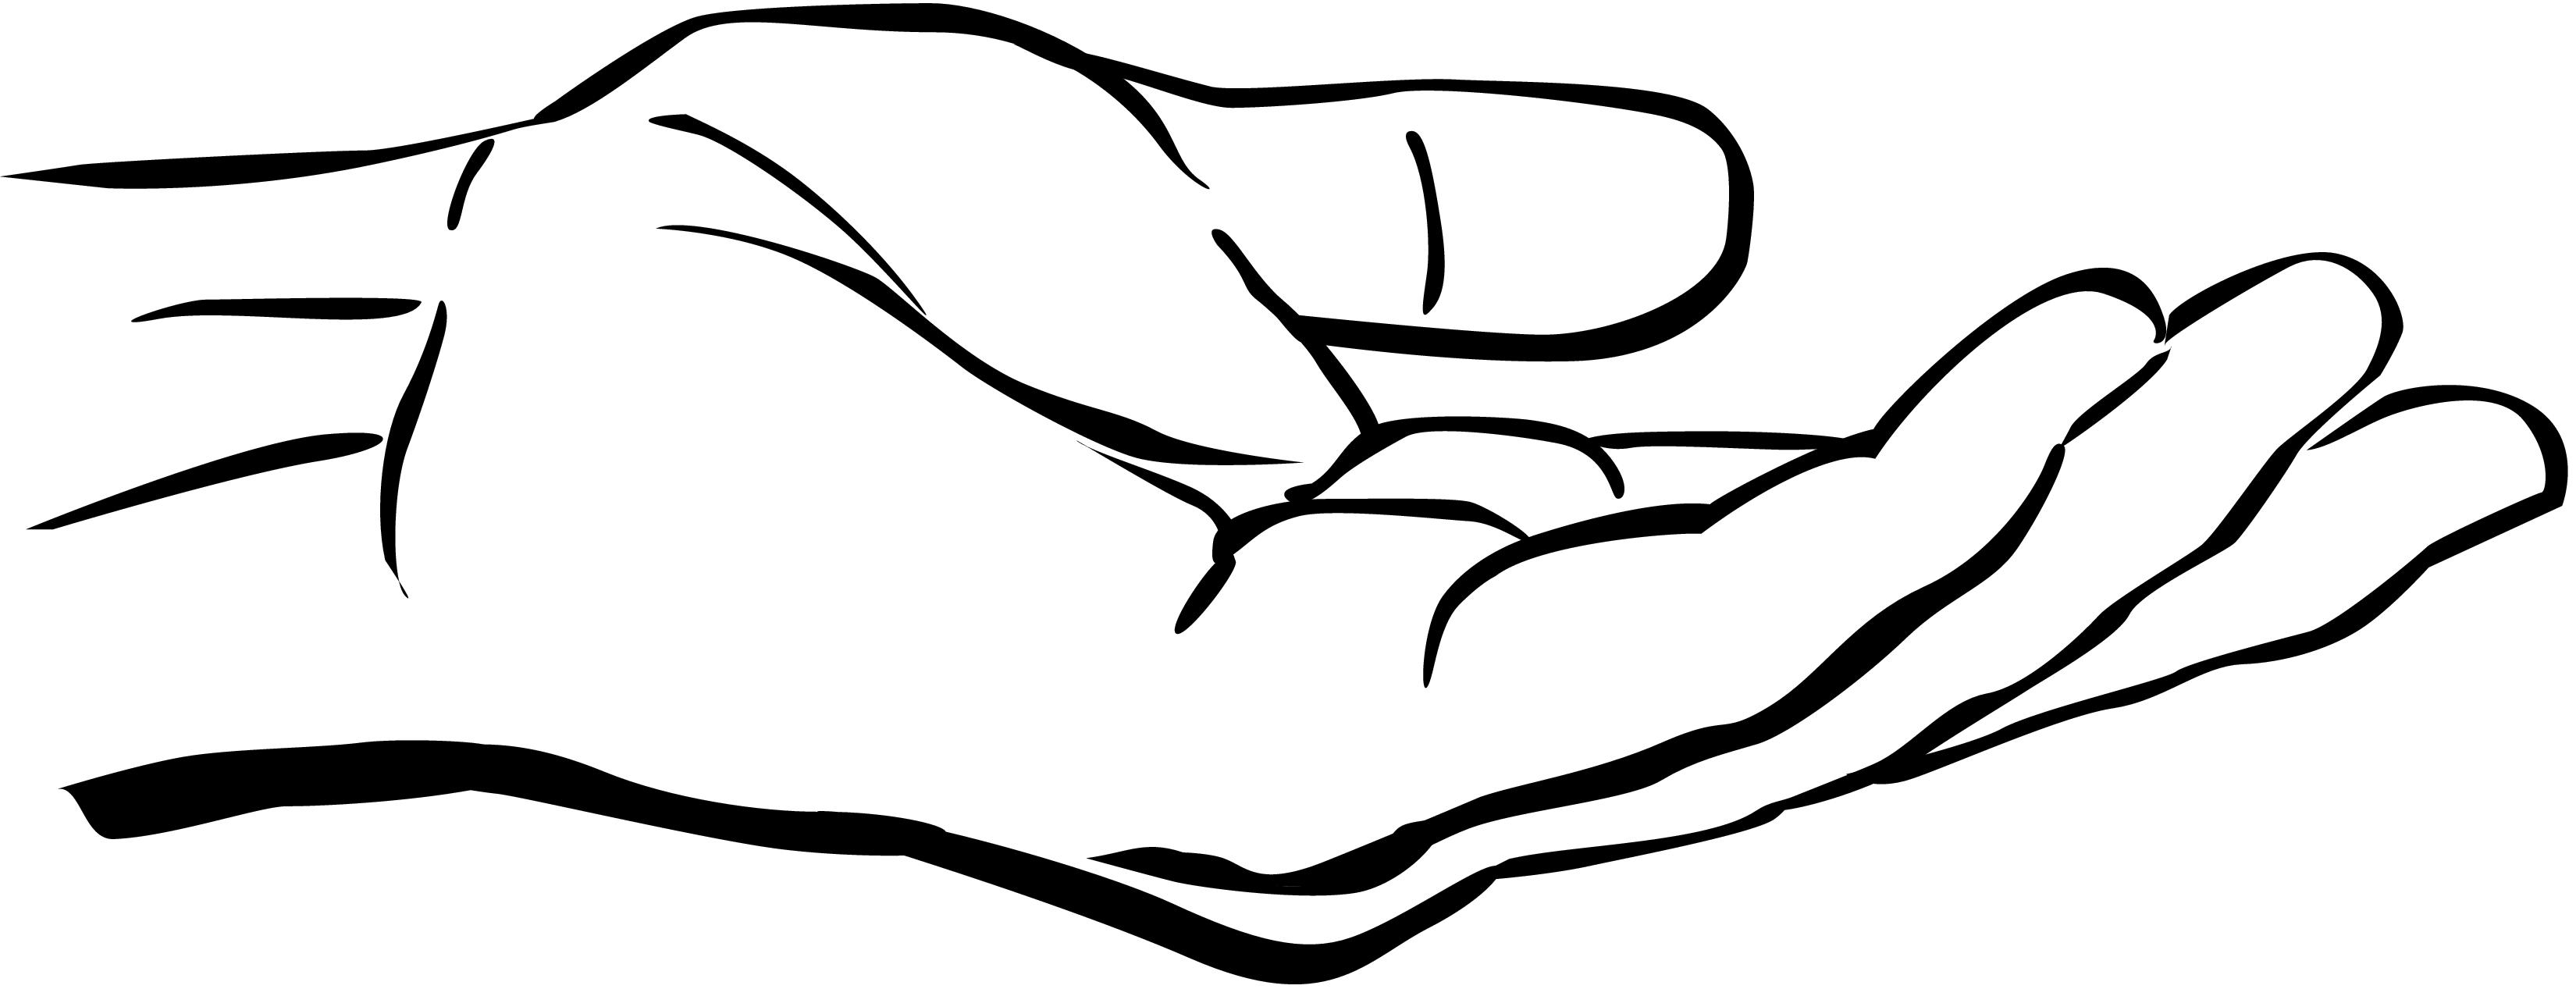 3300x1267 Hand Clip Art Many Interesting Cliparts